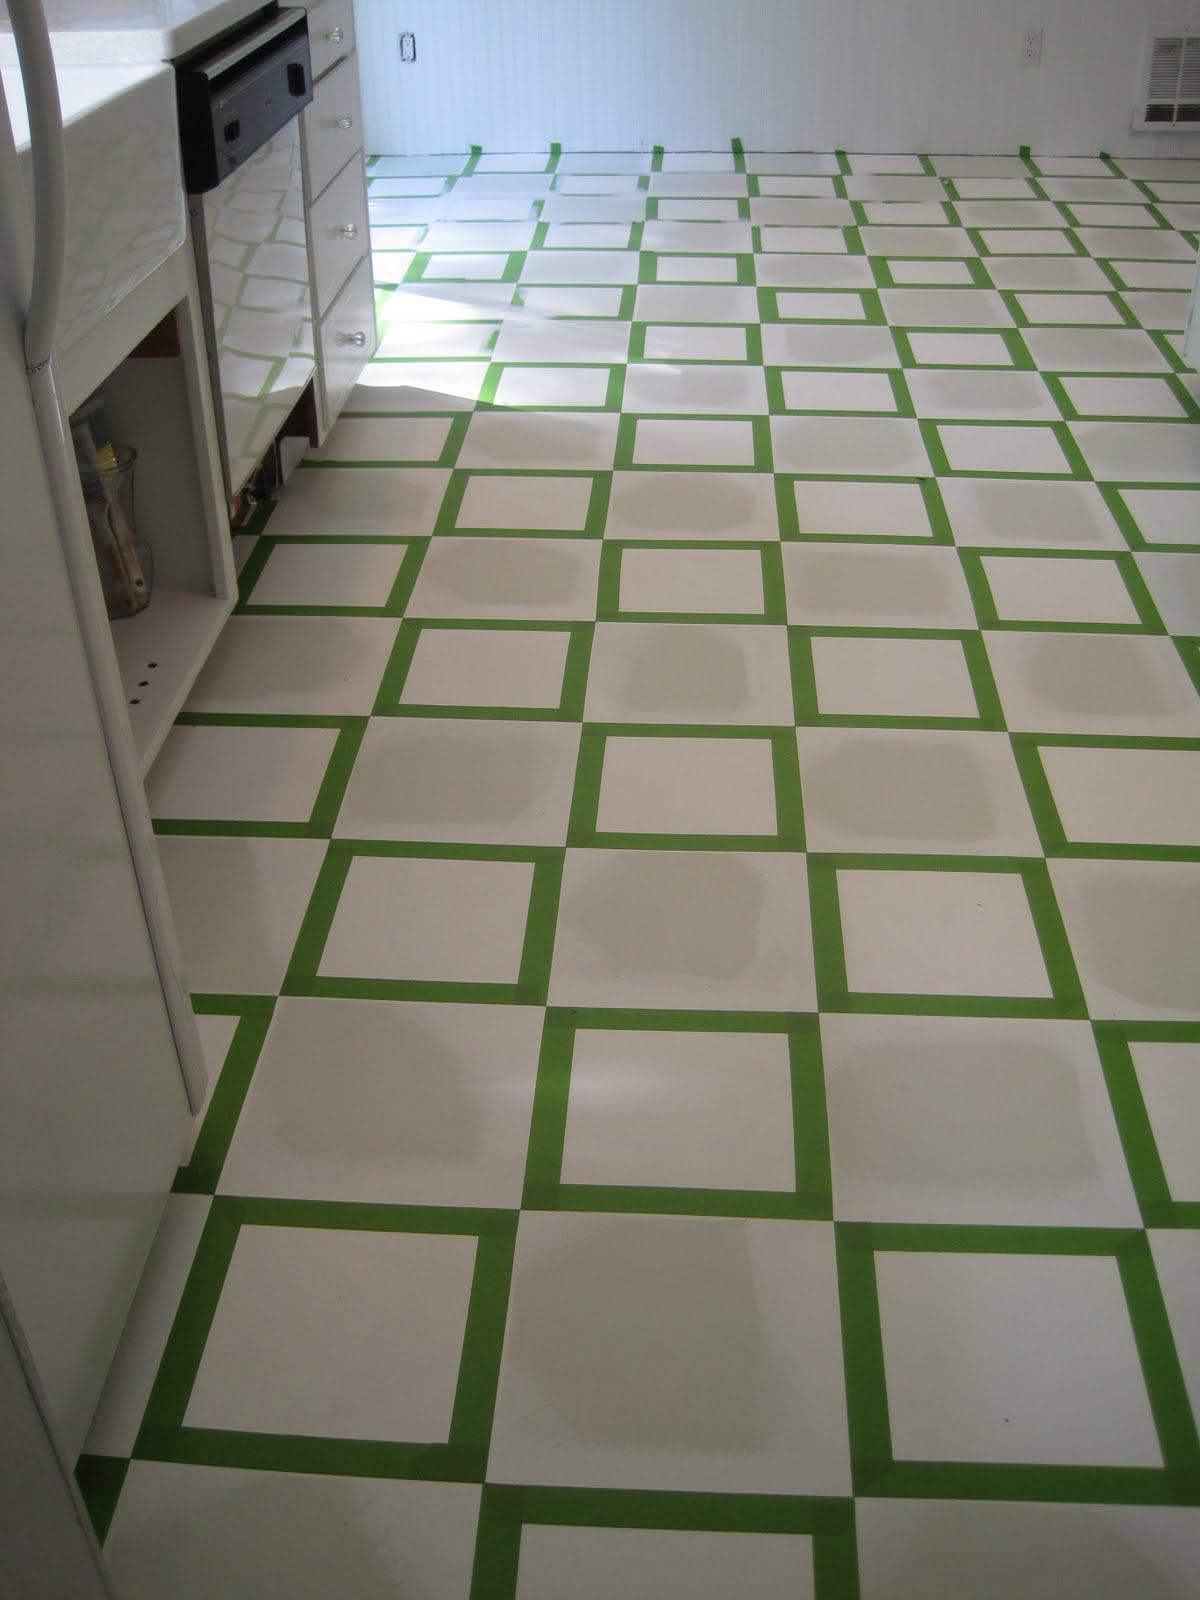 How To Paint Vinyl Or Linoleum Sheet Flooring - Induced.Info